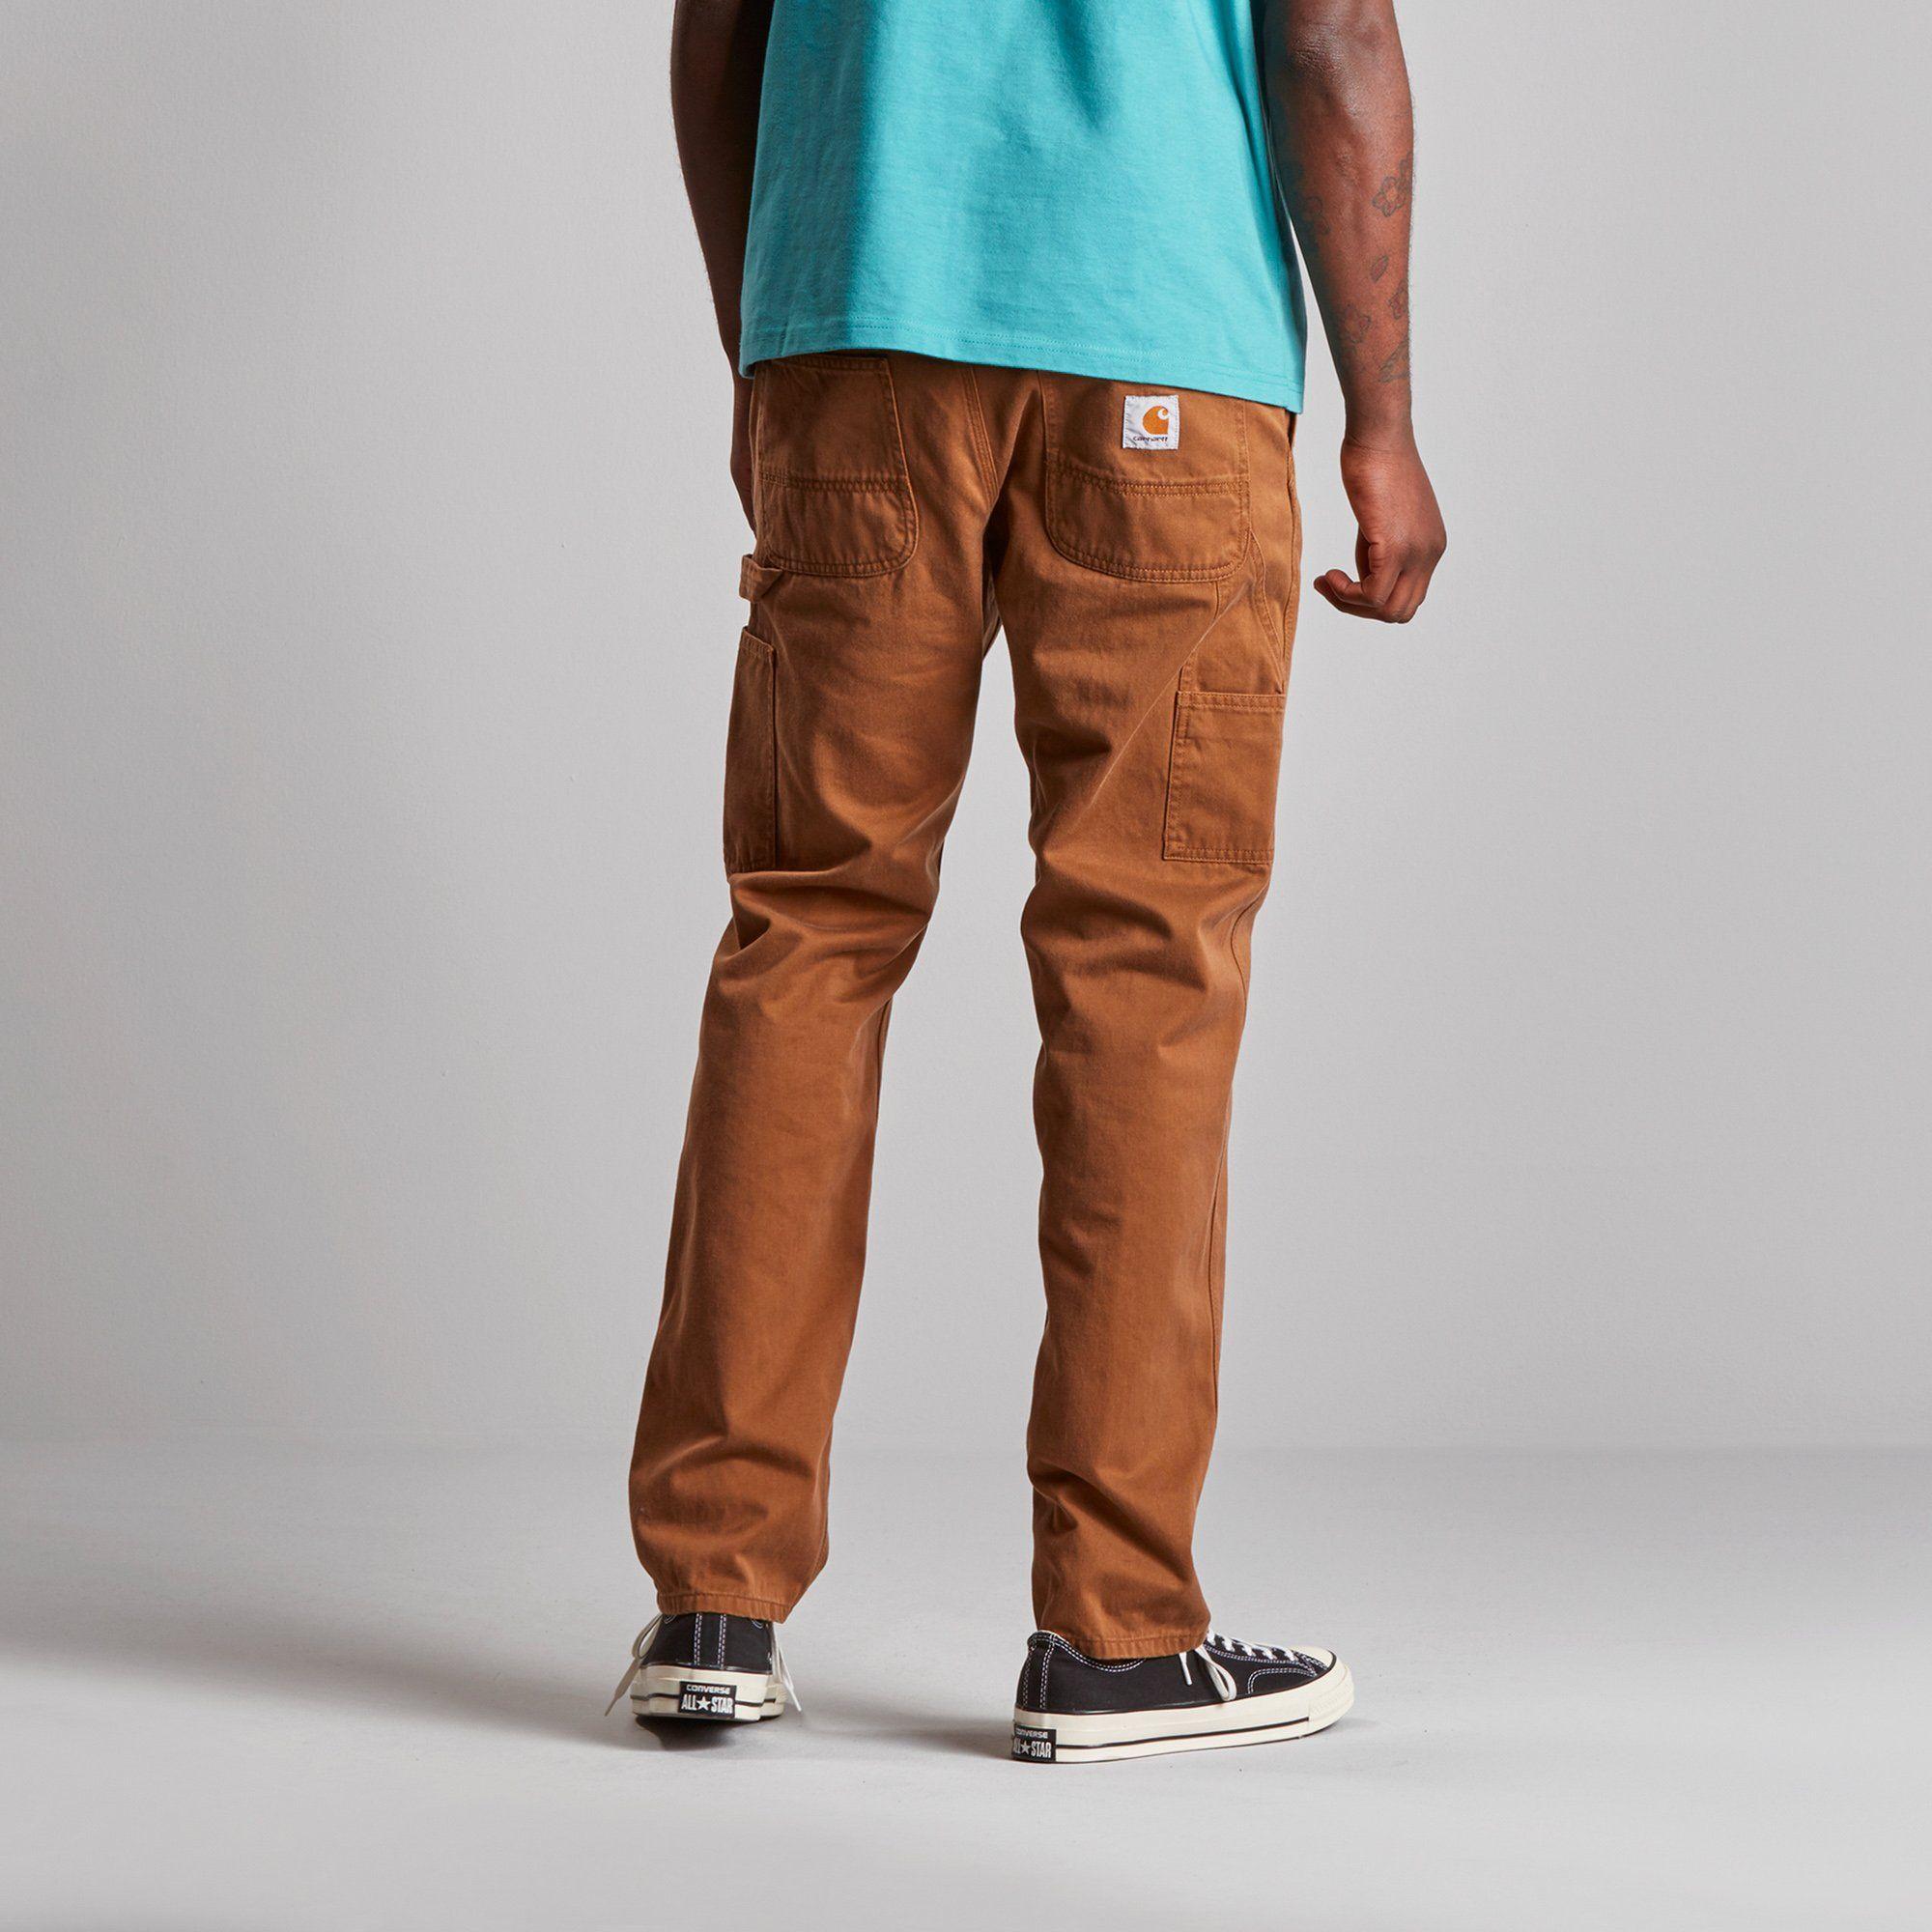 4c4c3d30758 Carhartt WIP Ruck Single Knee Pant   Hamilton Brown – Carhartt WIP USA